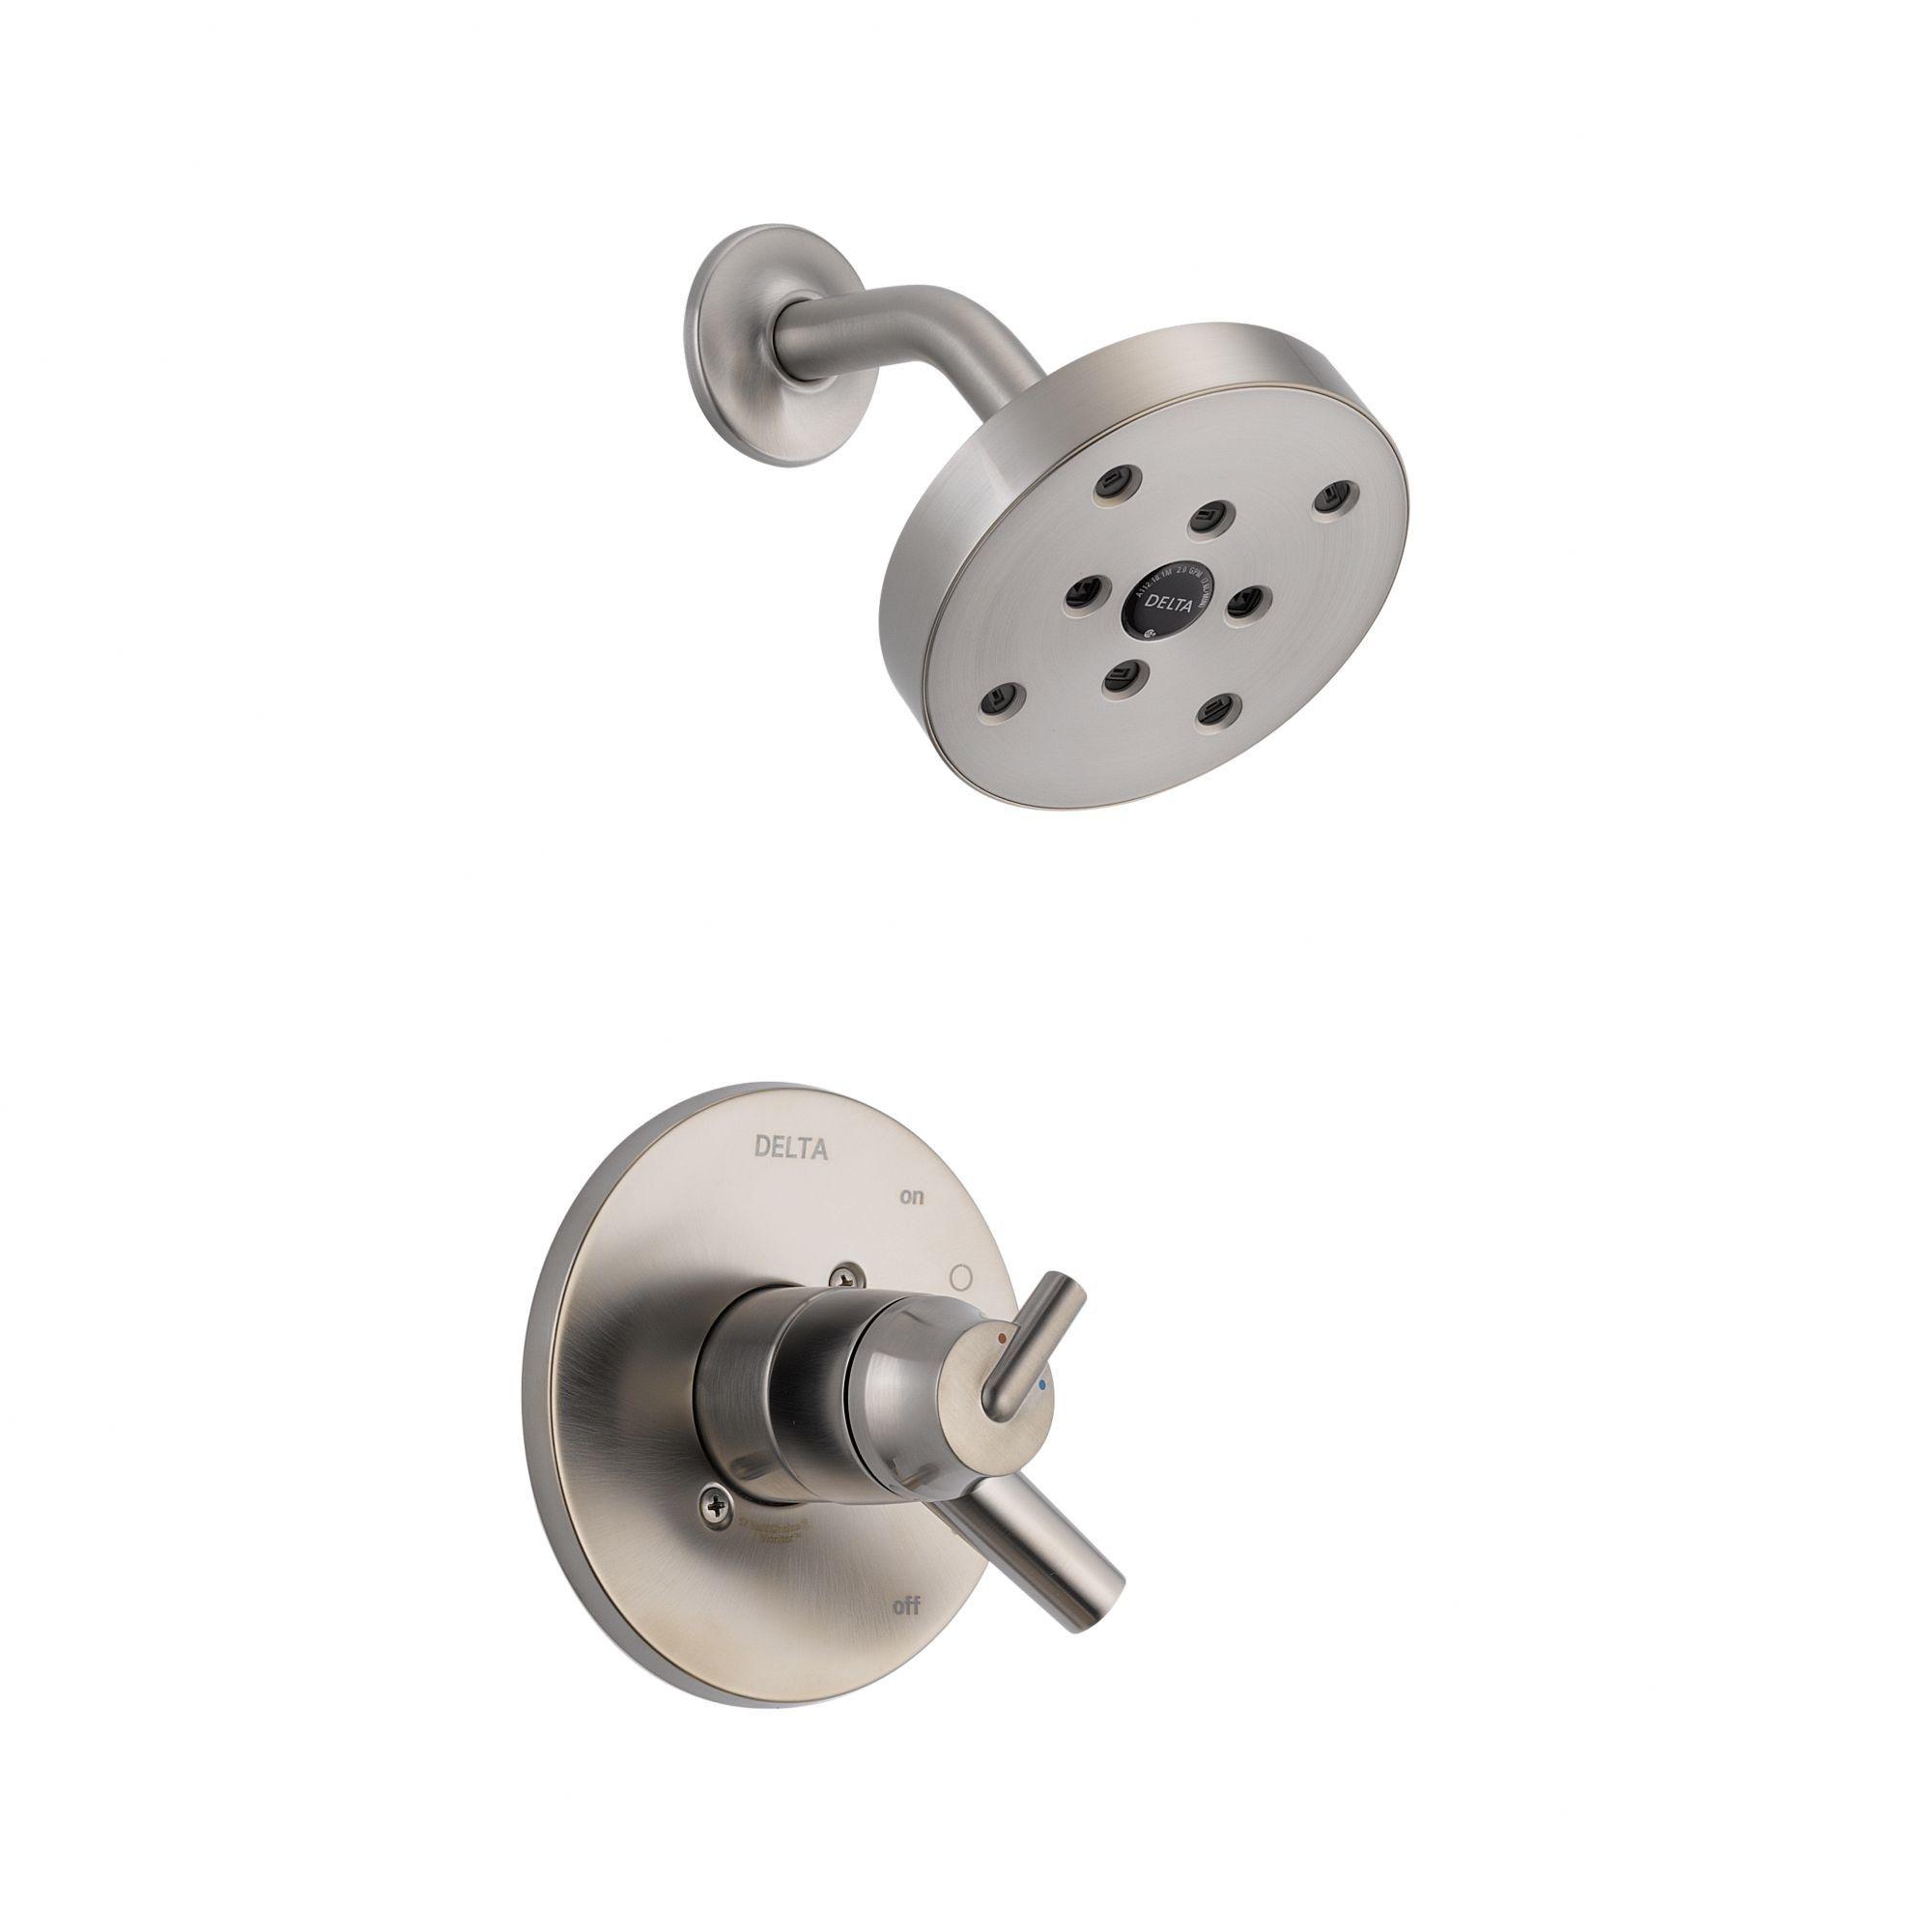 Trinsic Bathroom Shower Faucet Trim with Lever Handles